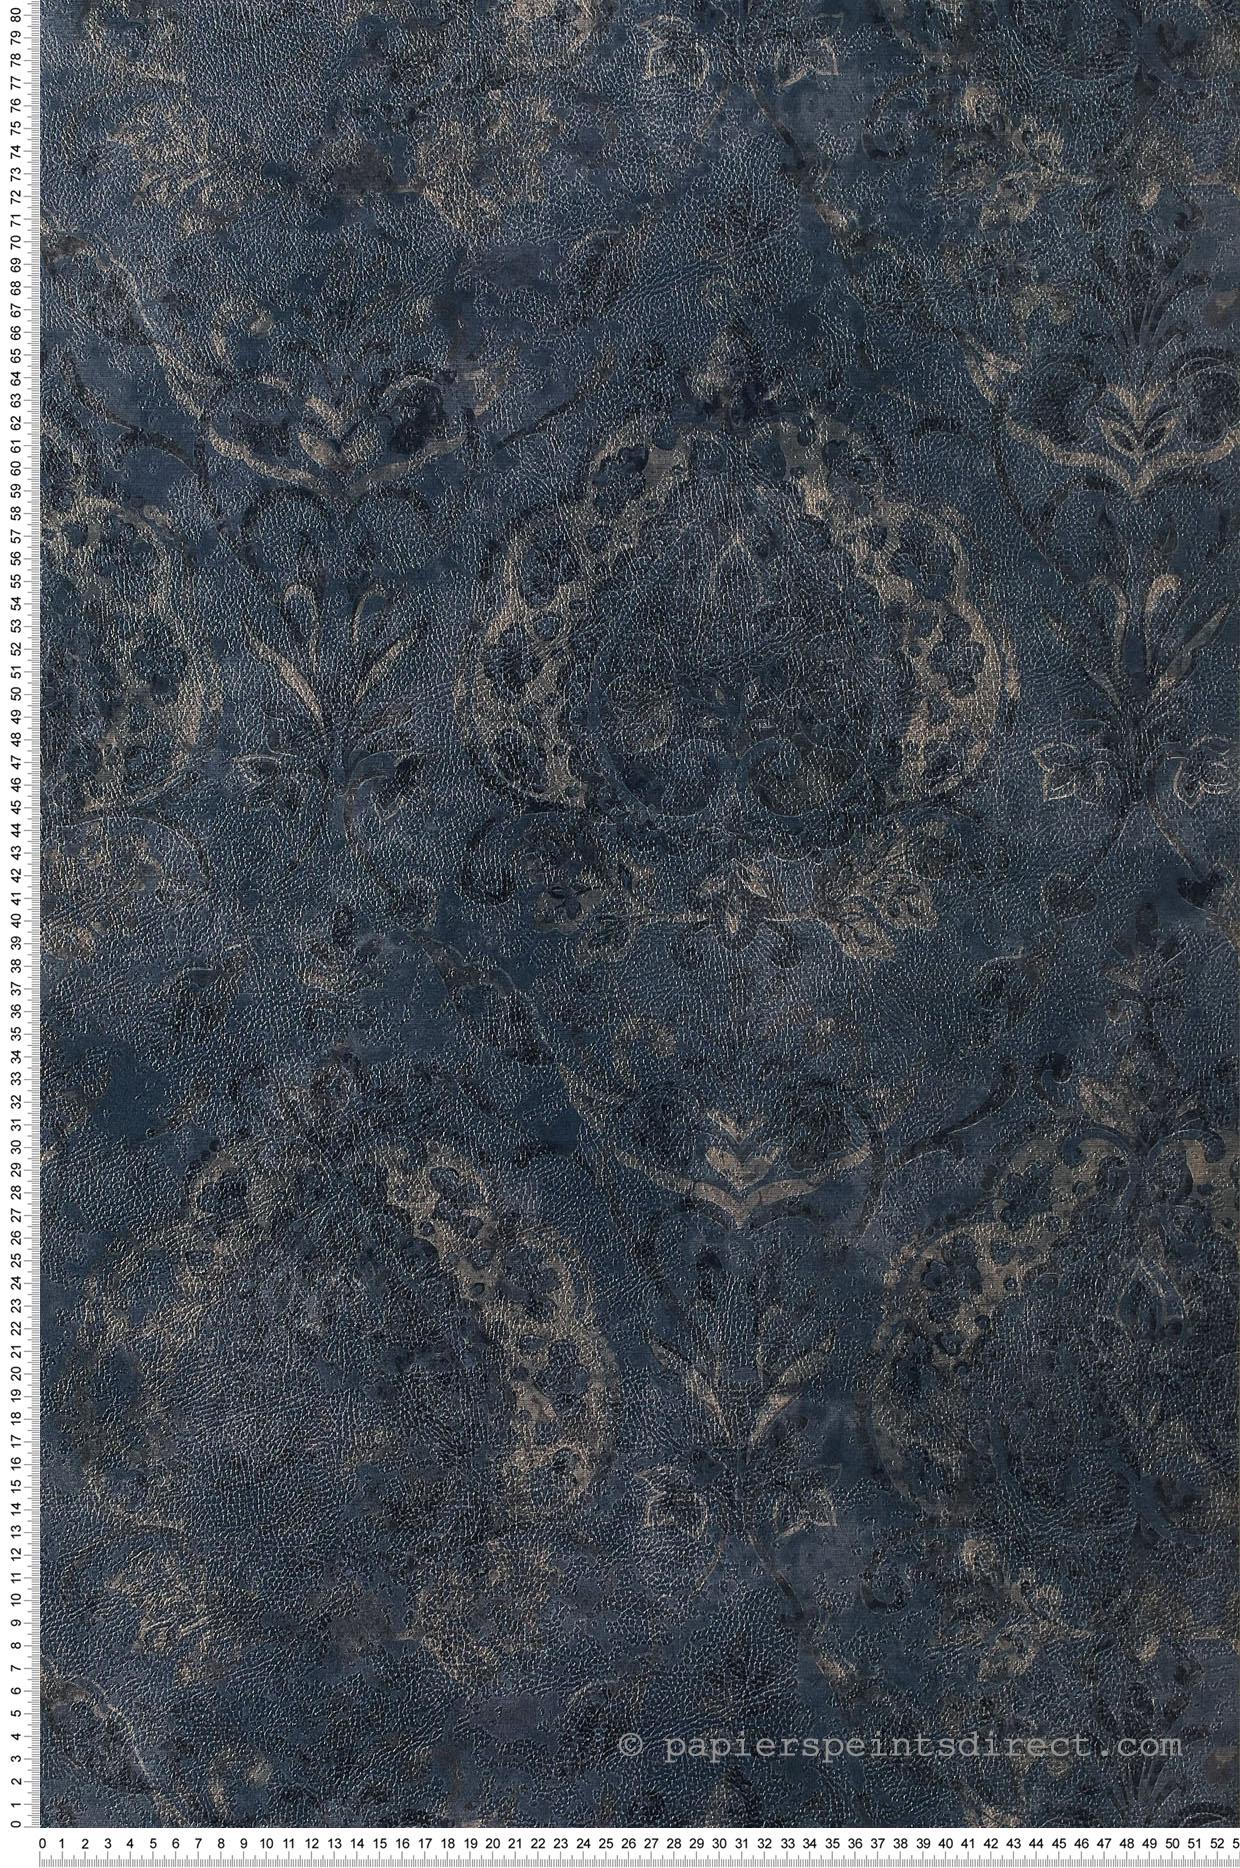 Papier peint vintage Damassé bleu foncé - Cordoba de Montecolino   Réf. MC-3727